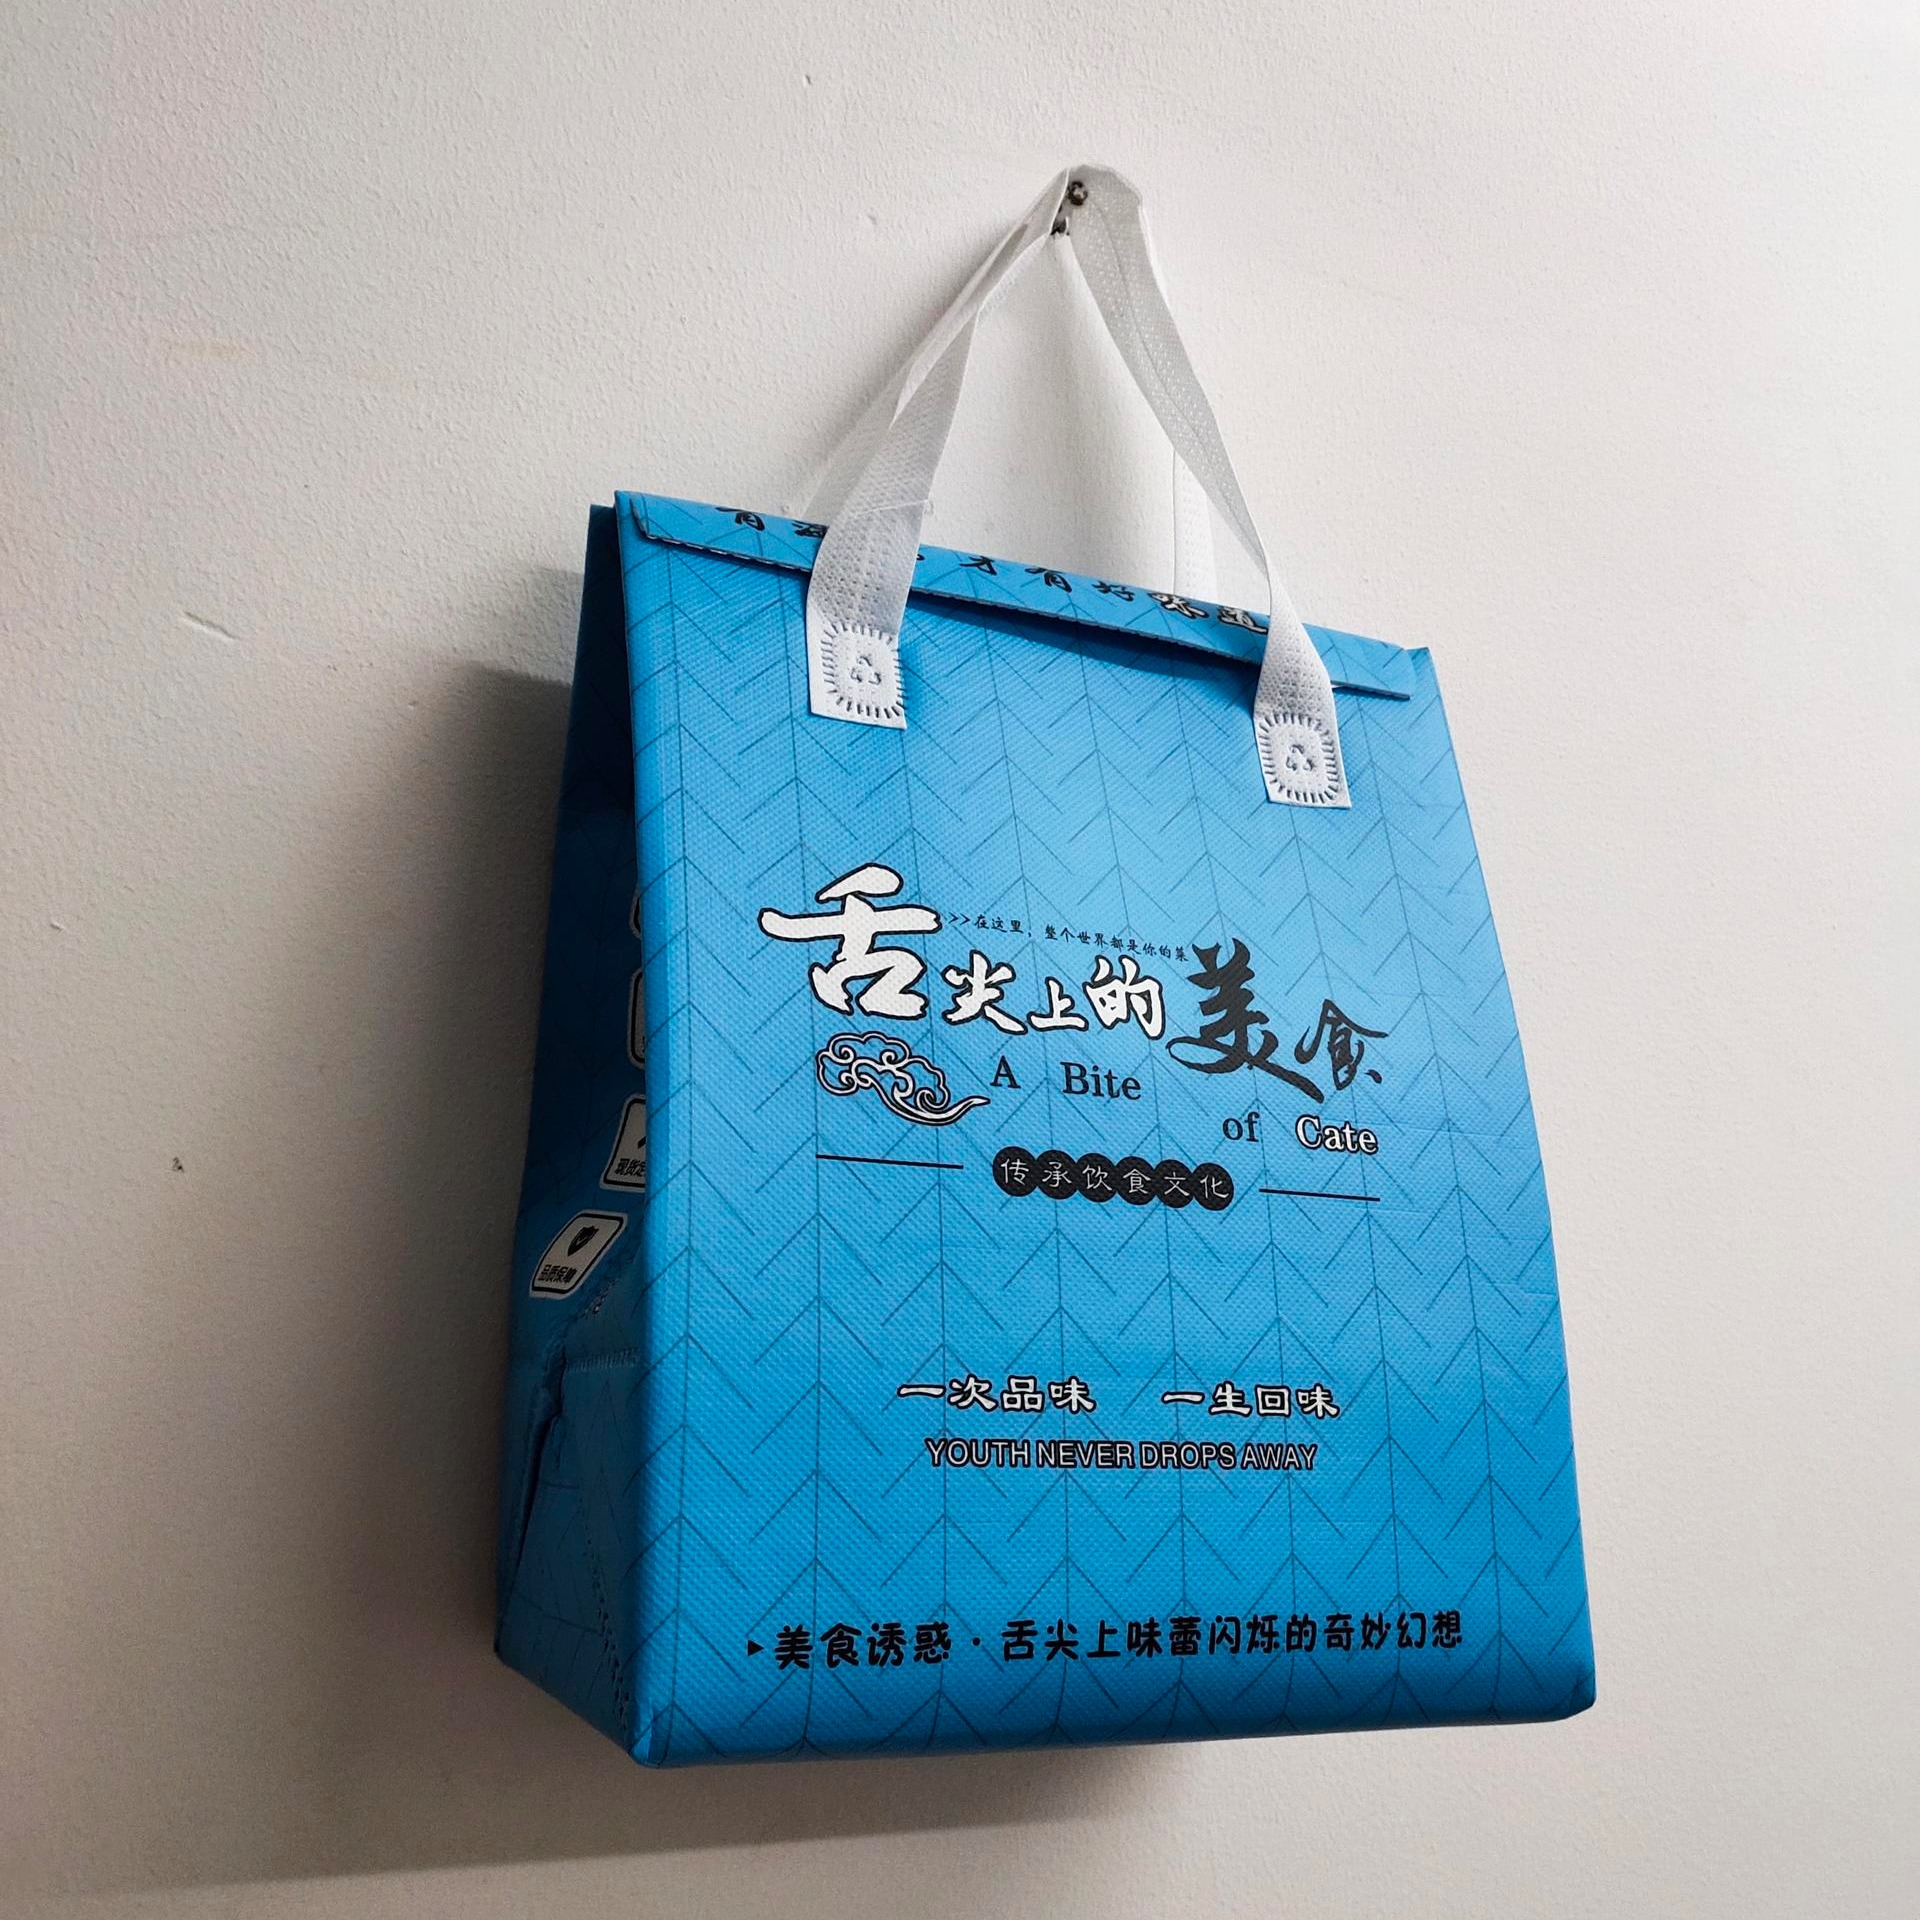 BW-6002廠家專業定制生產無紡布保溫立體袋、鋁膜保溫袋、珍珠棉保溫袋、保溫外賣袋、購物袋、環保袋、帆布袋、棉布袋